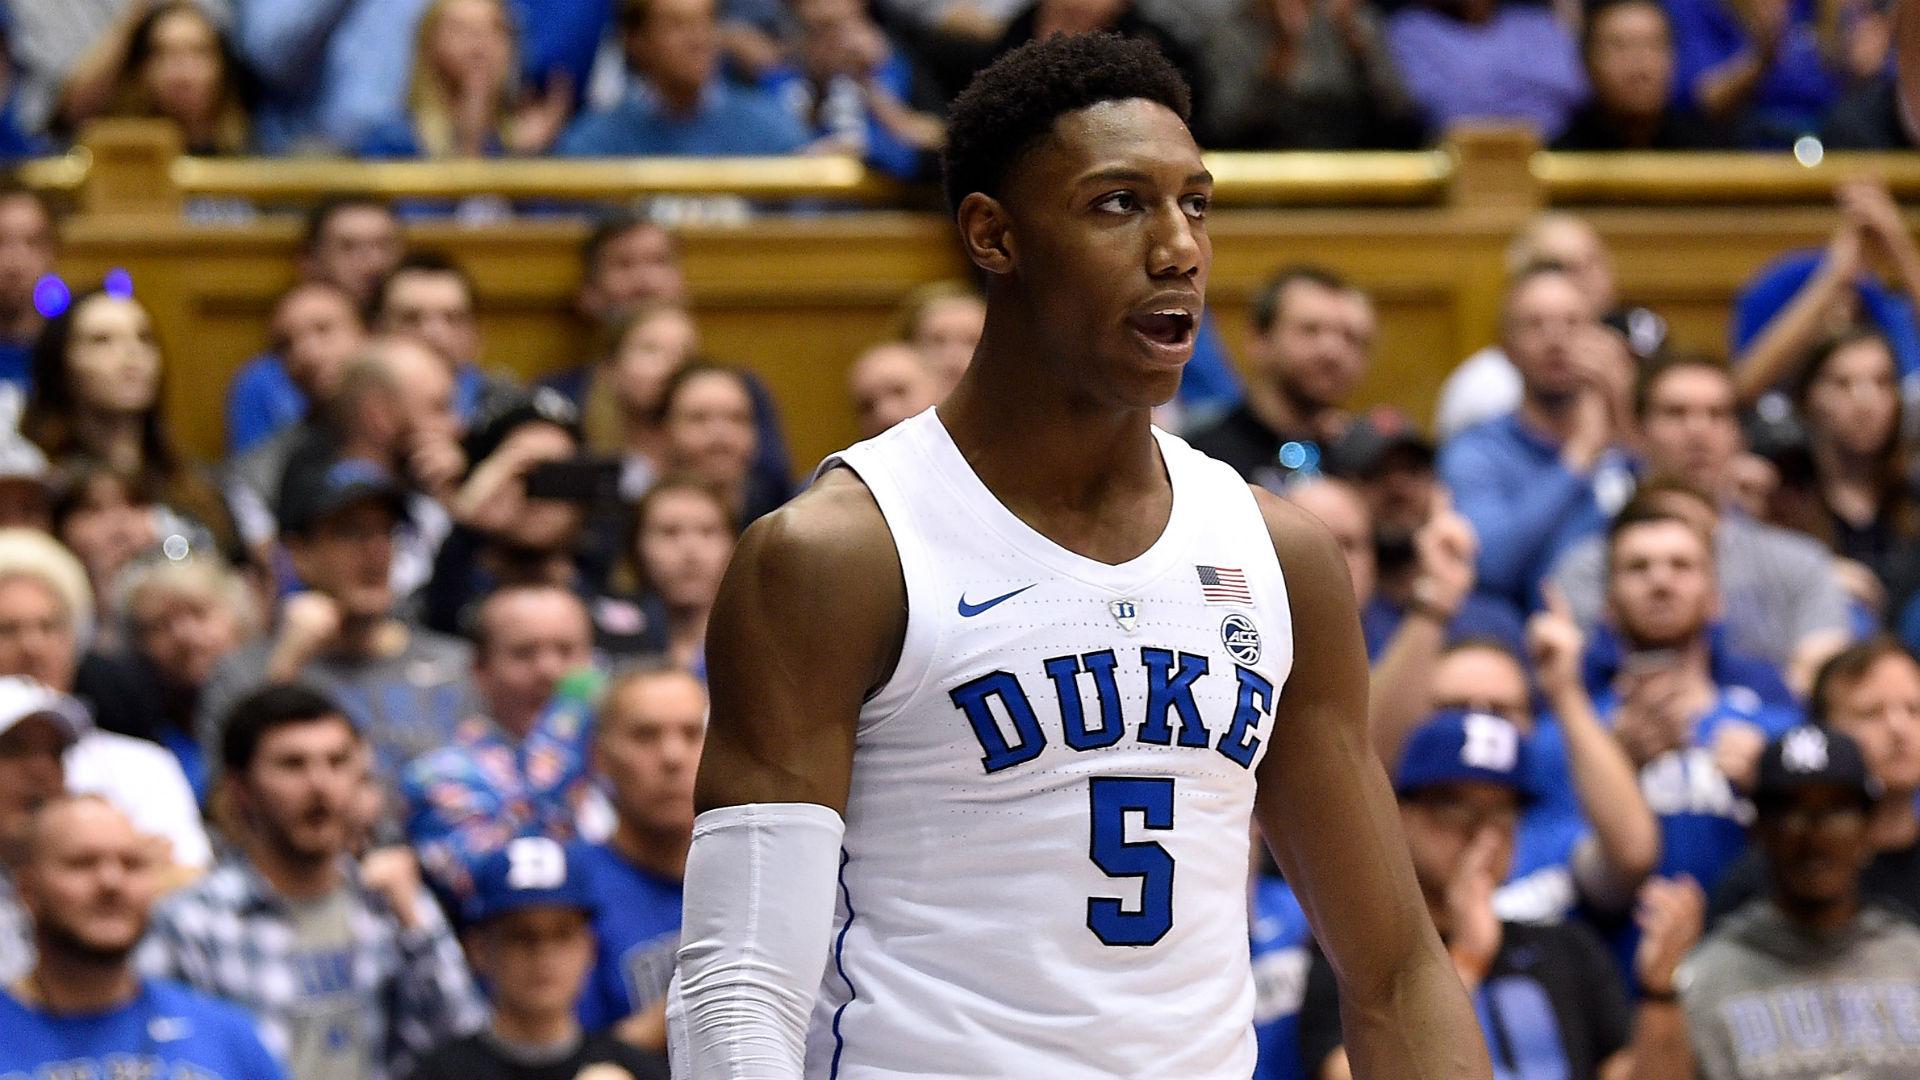 NBA Draft 2019 rumors: Knicks 'locked' in on taking RJ Barrett, not Darius Garland